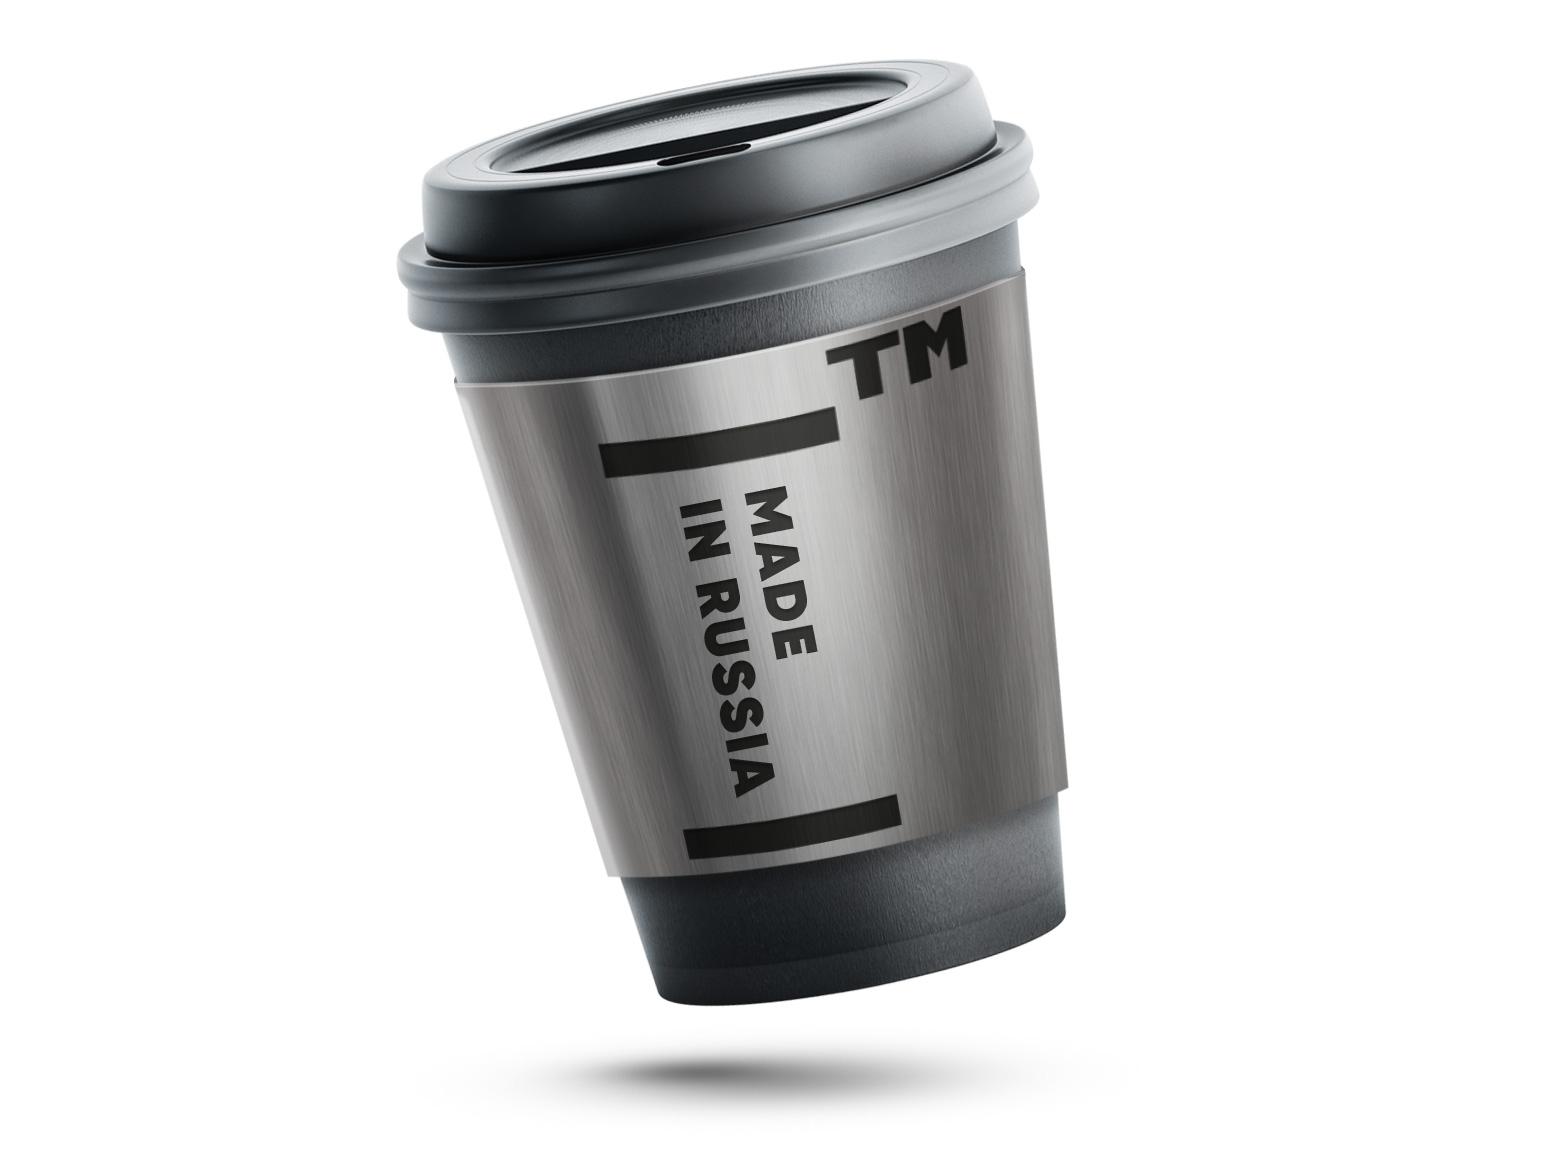 ITM: Innovative Technologies of Metalwork / World Brand & Packaging Design Society